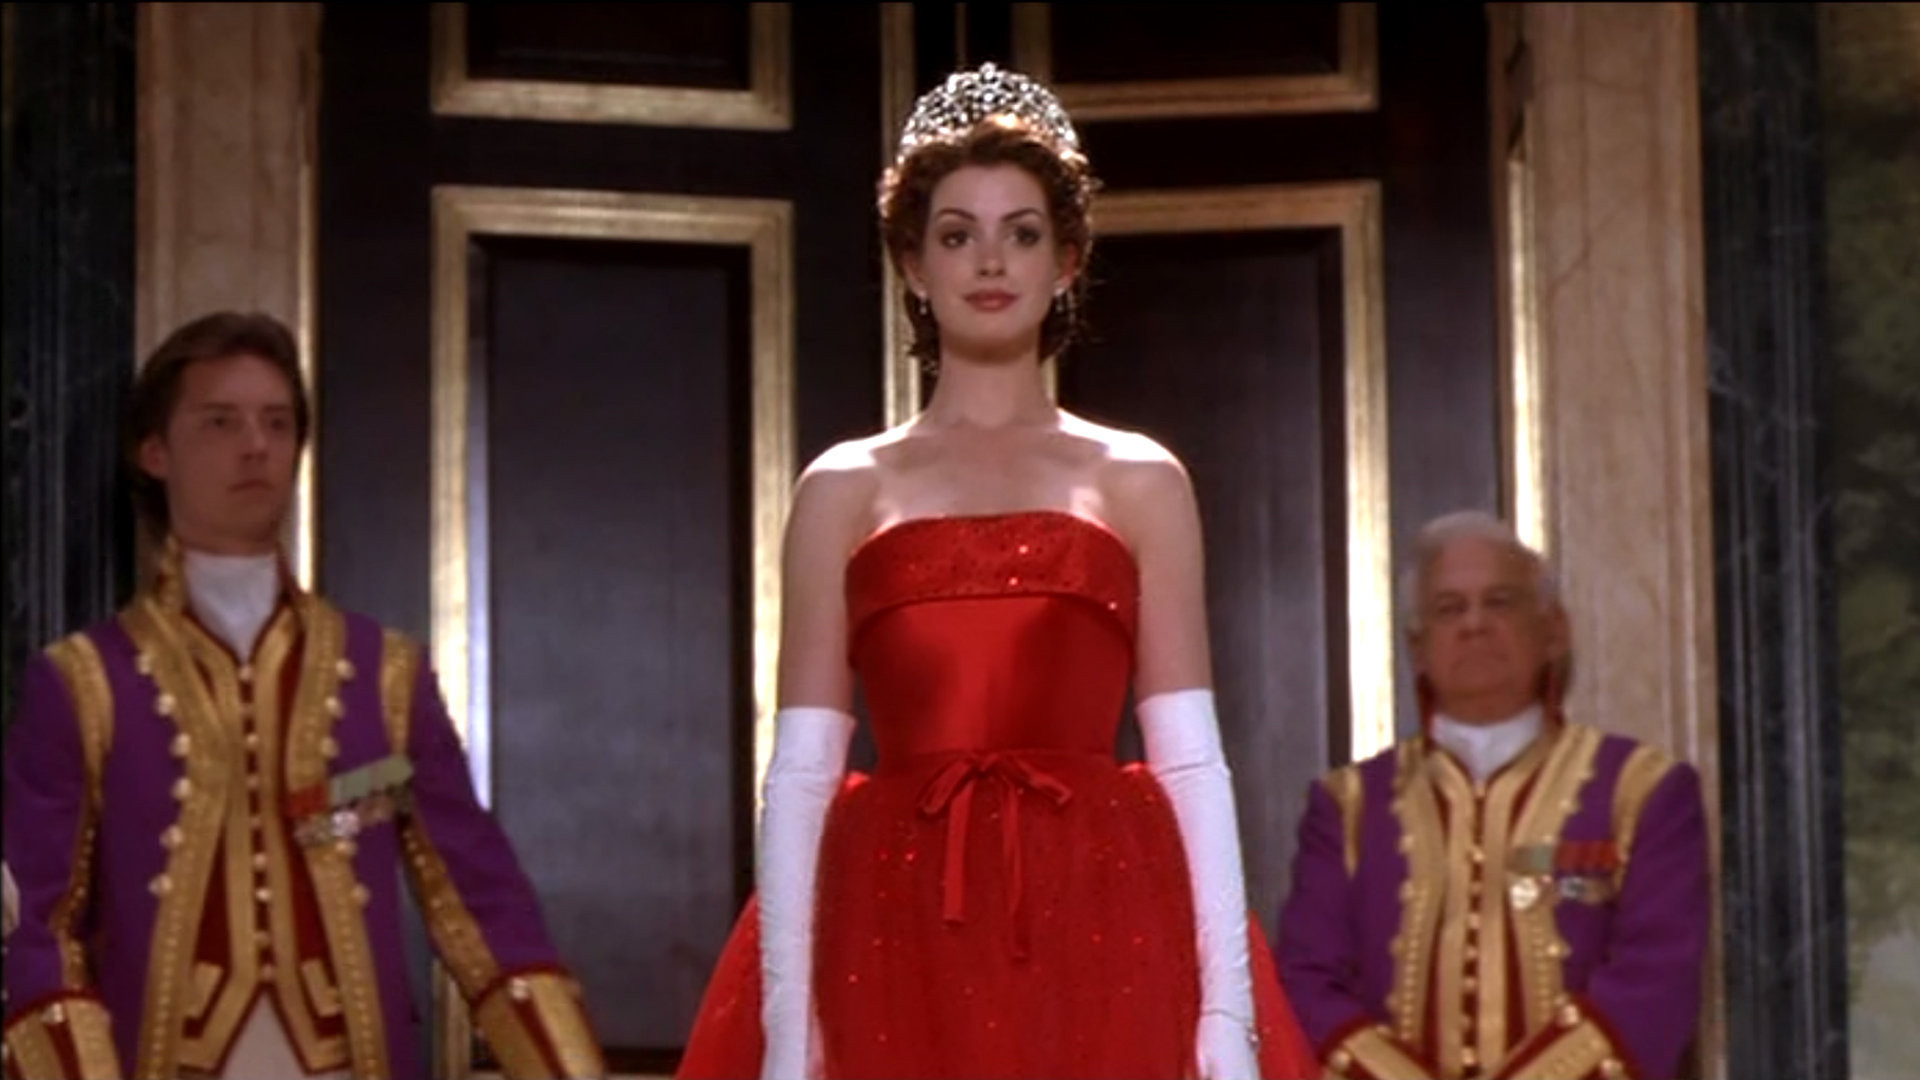 Anne hathaway princess diaries 2 red dress